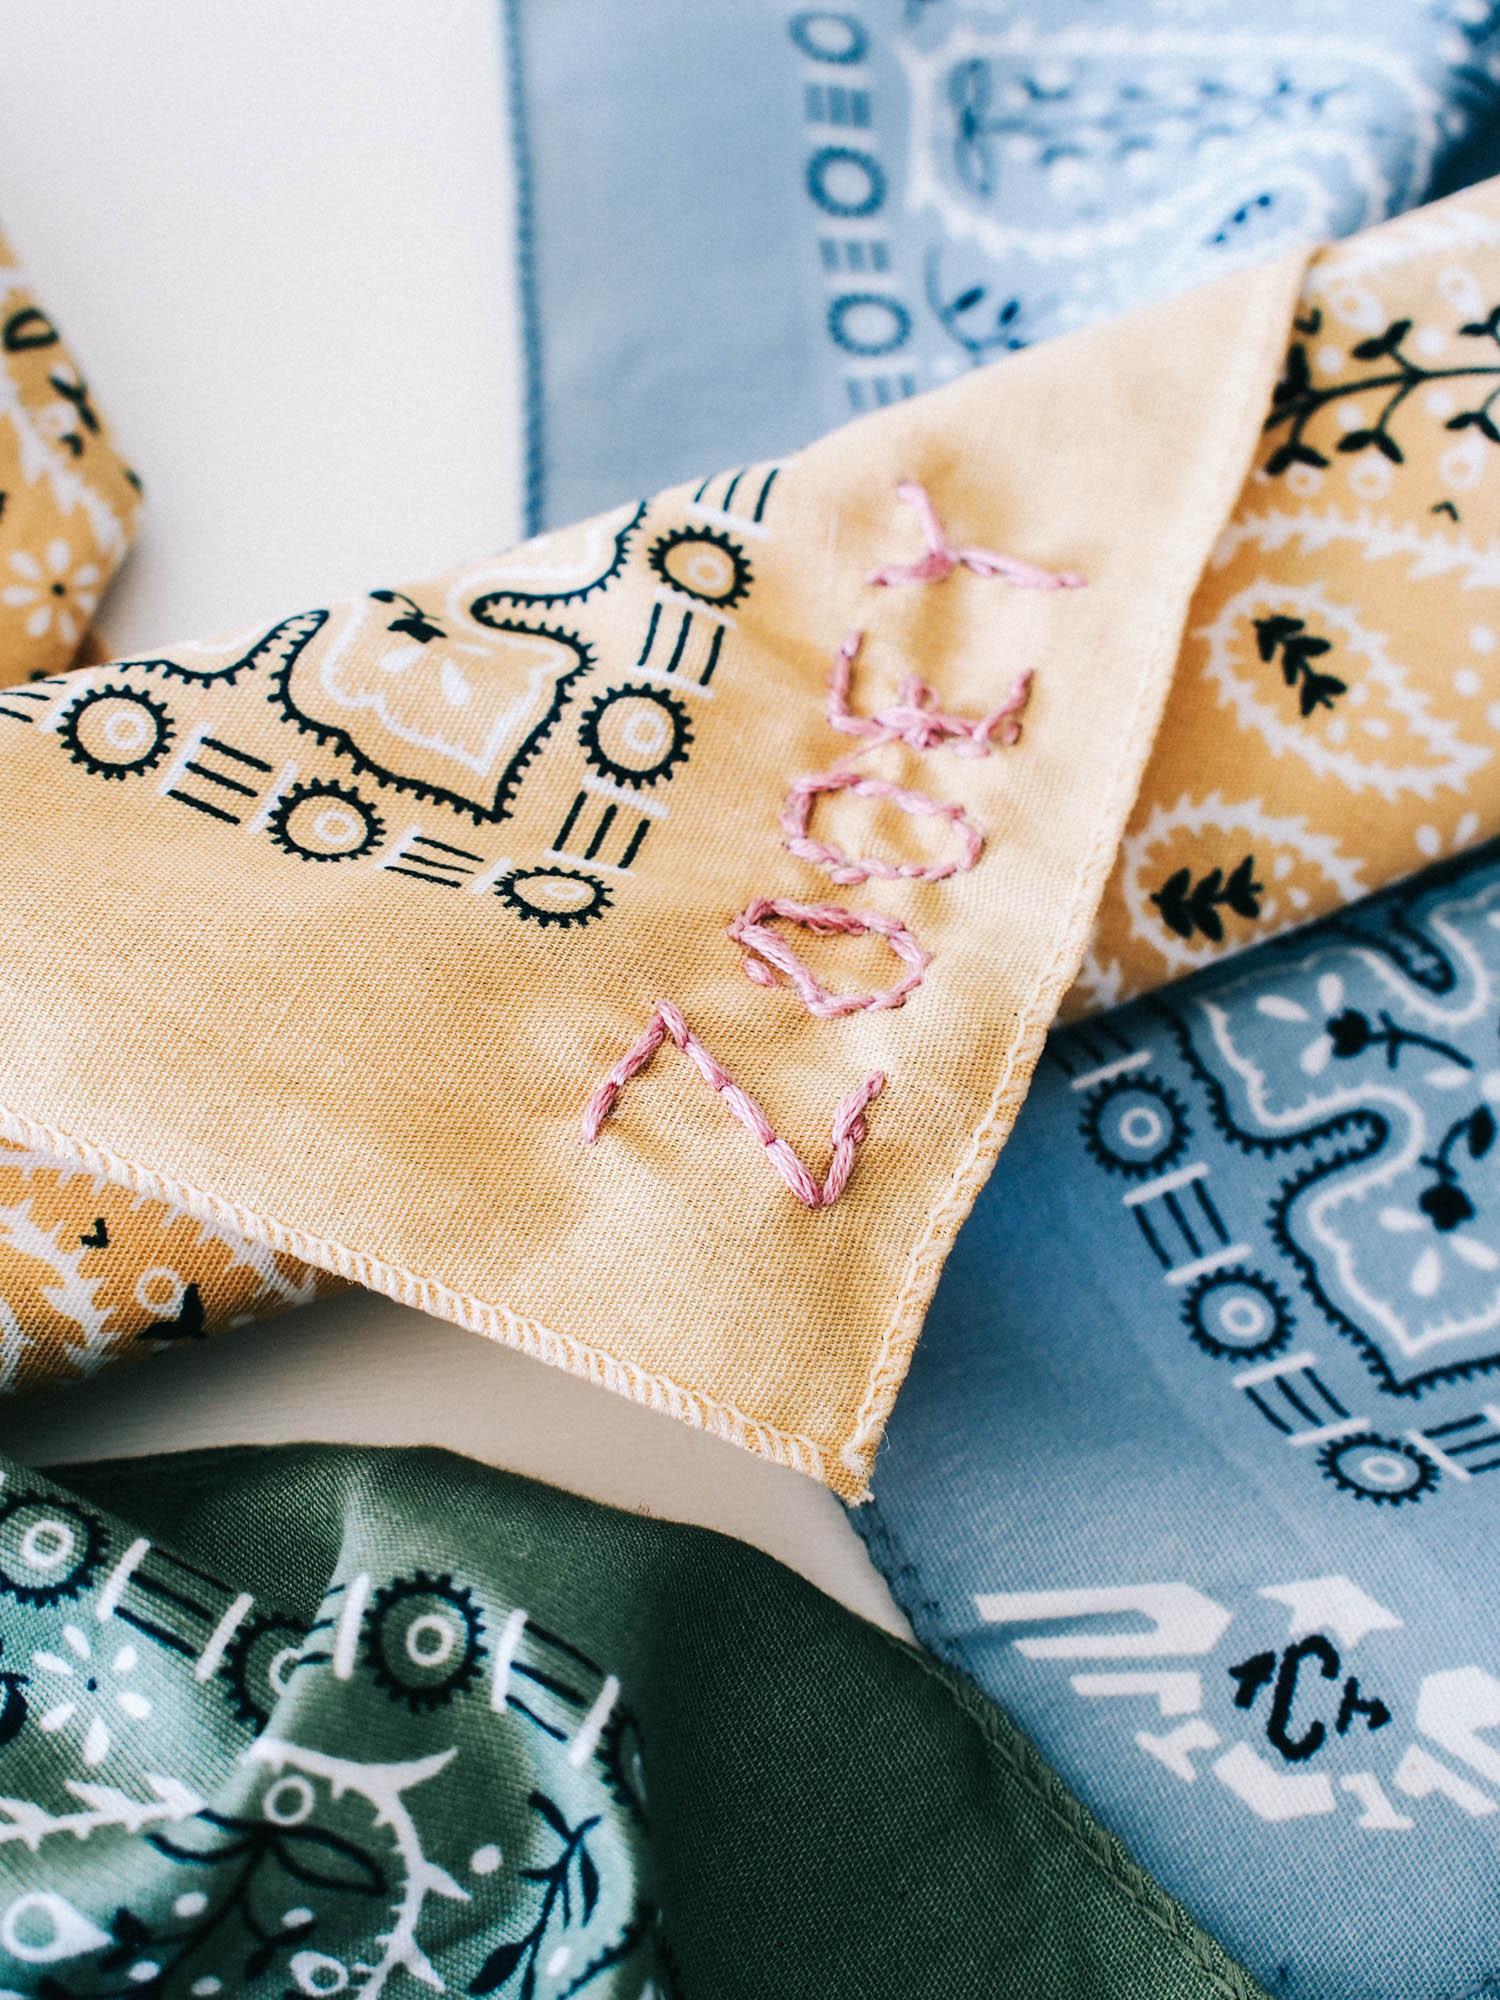 Easy last minute gifts | A Fabulous Fete